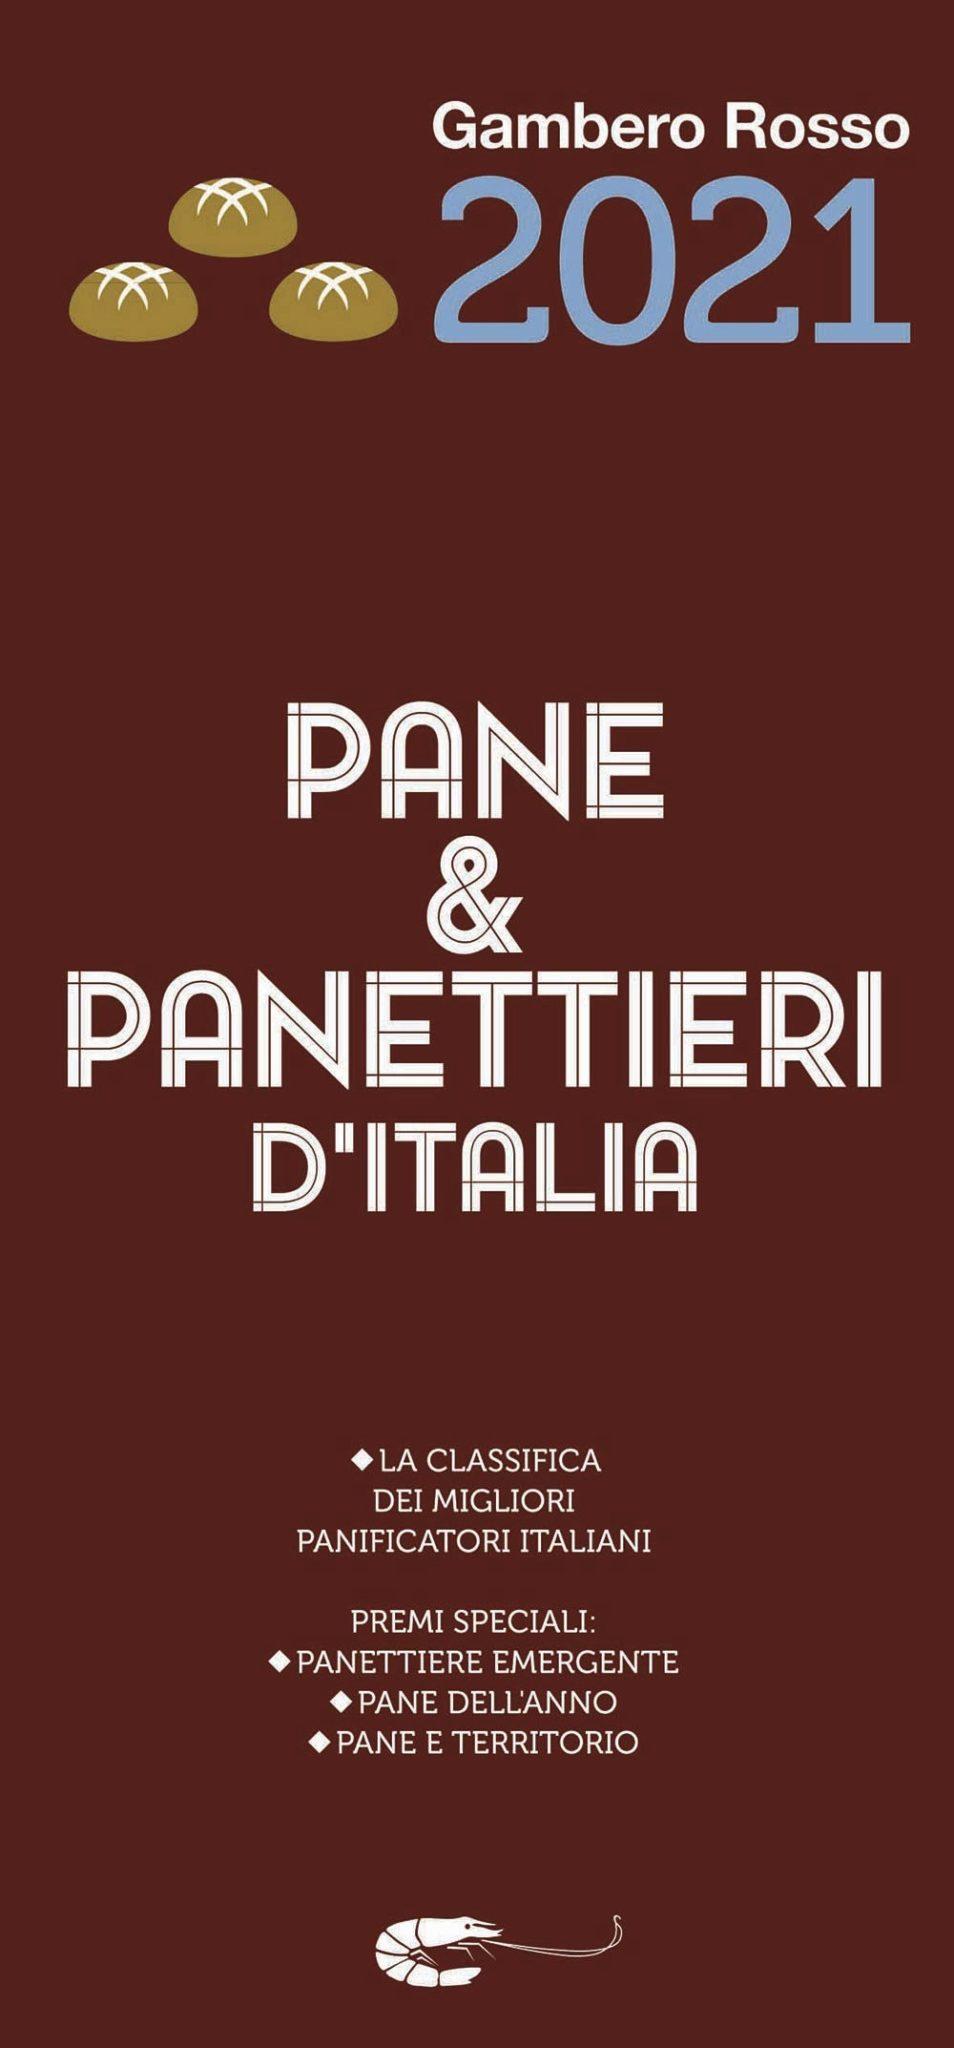 Recensione di Pane & Panettieri D'Italia 2021 – Gambero Rosso